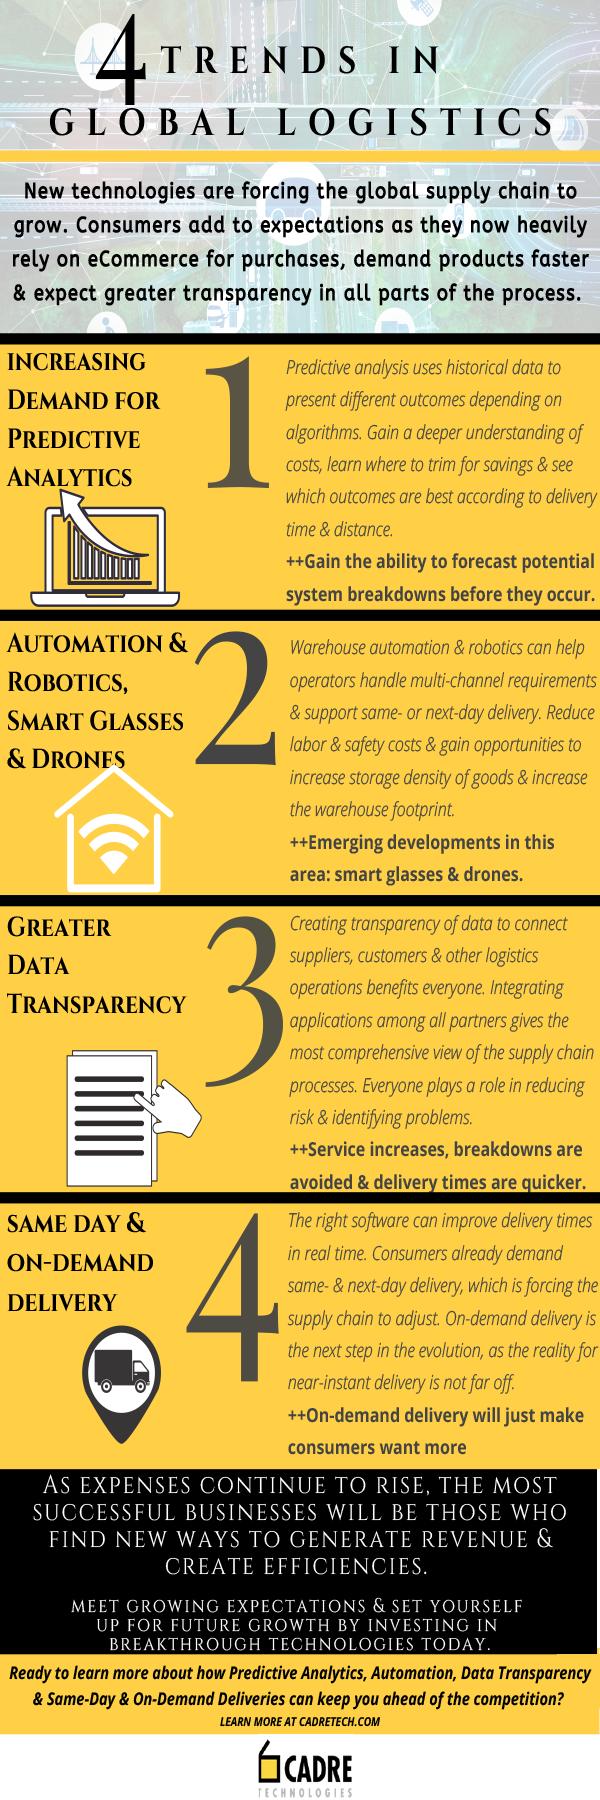 Cadre_4 Trends Infographic_v2 new